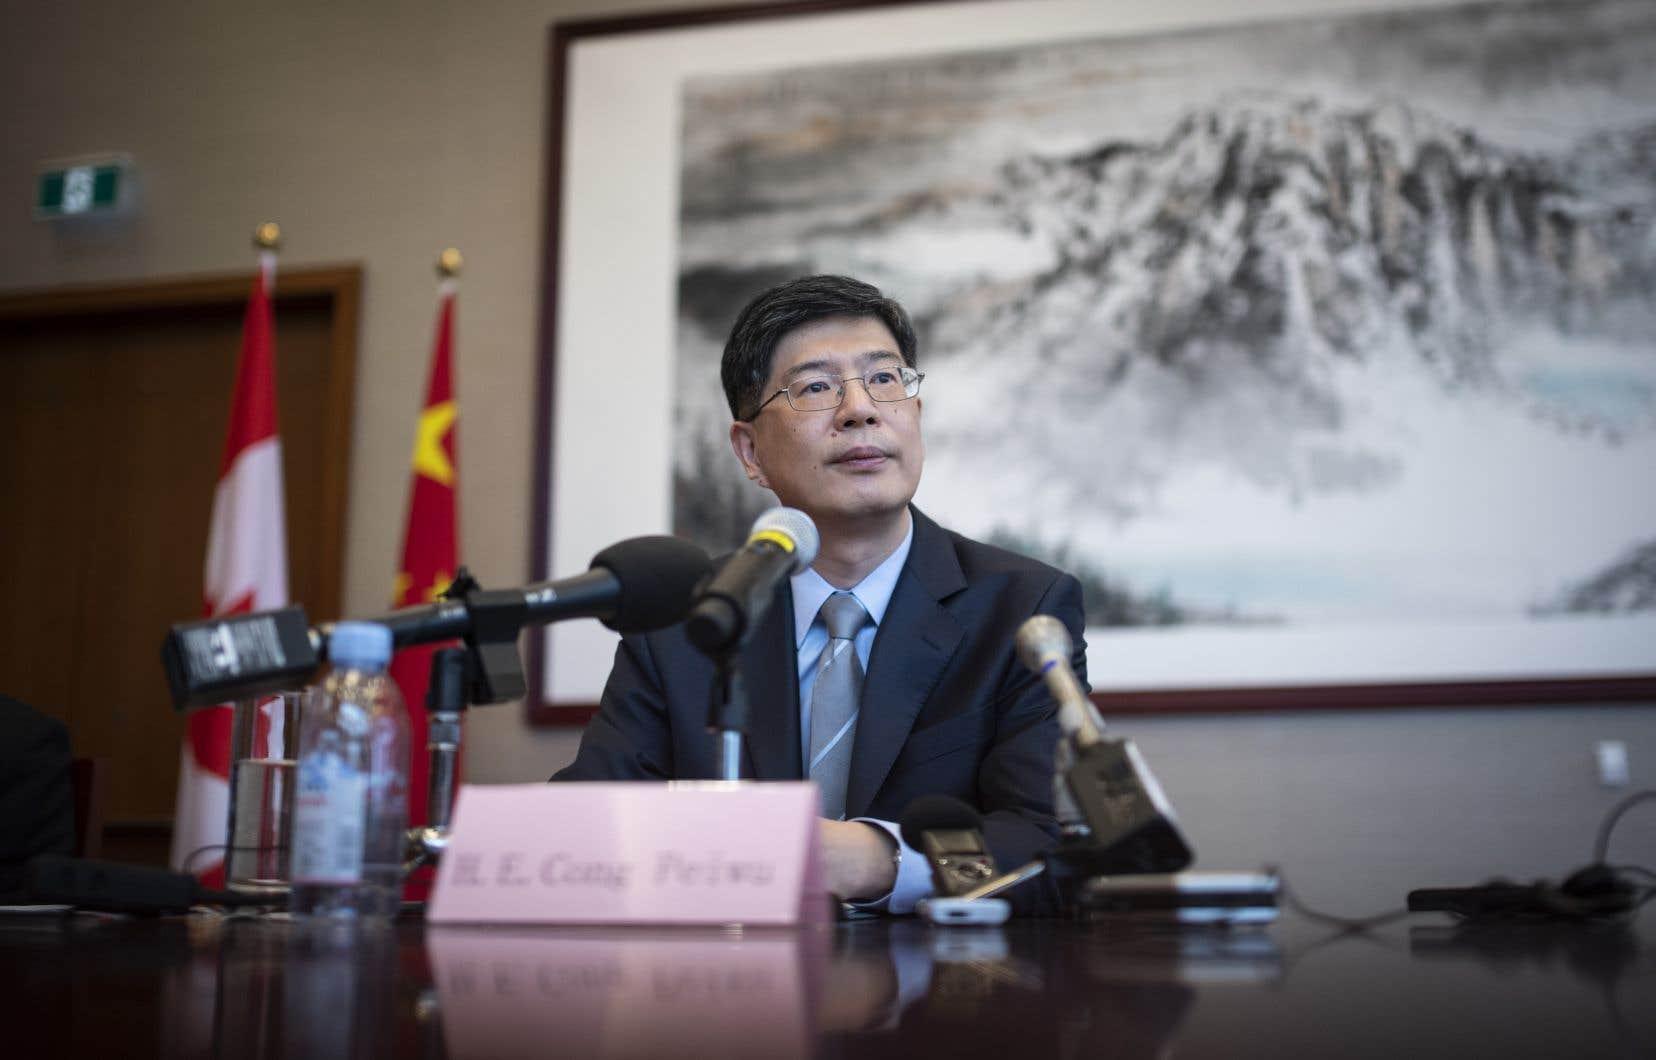 L'ambassadeur de Chine au Canada, Peiwu Cong, en 2019.